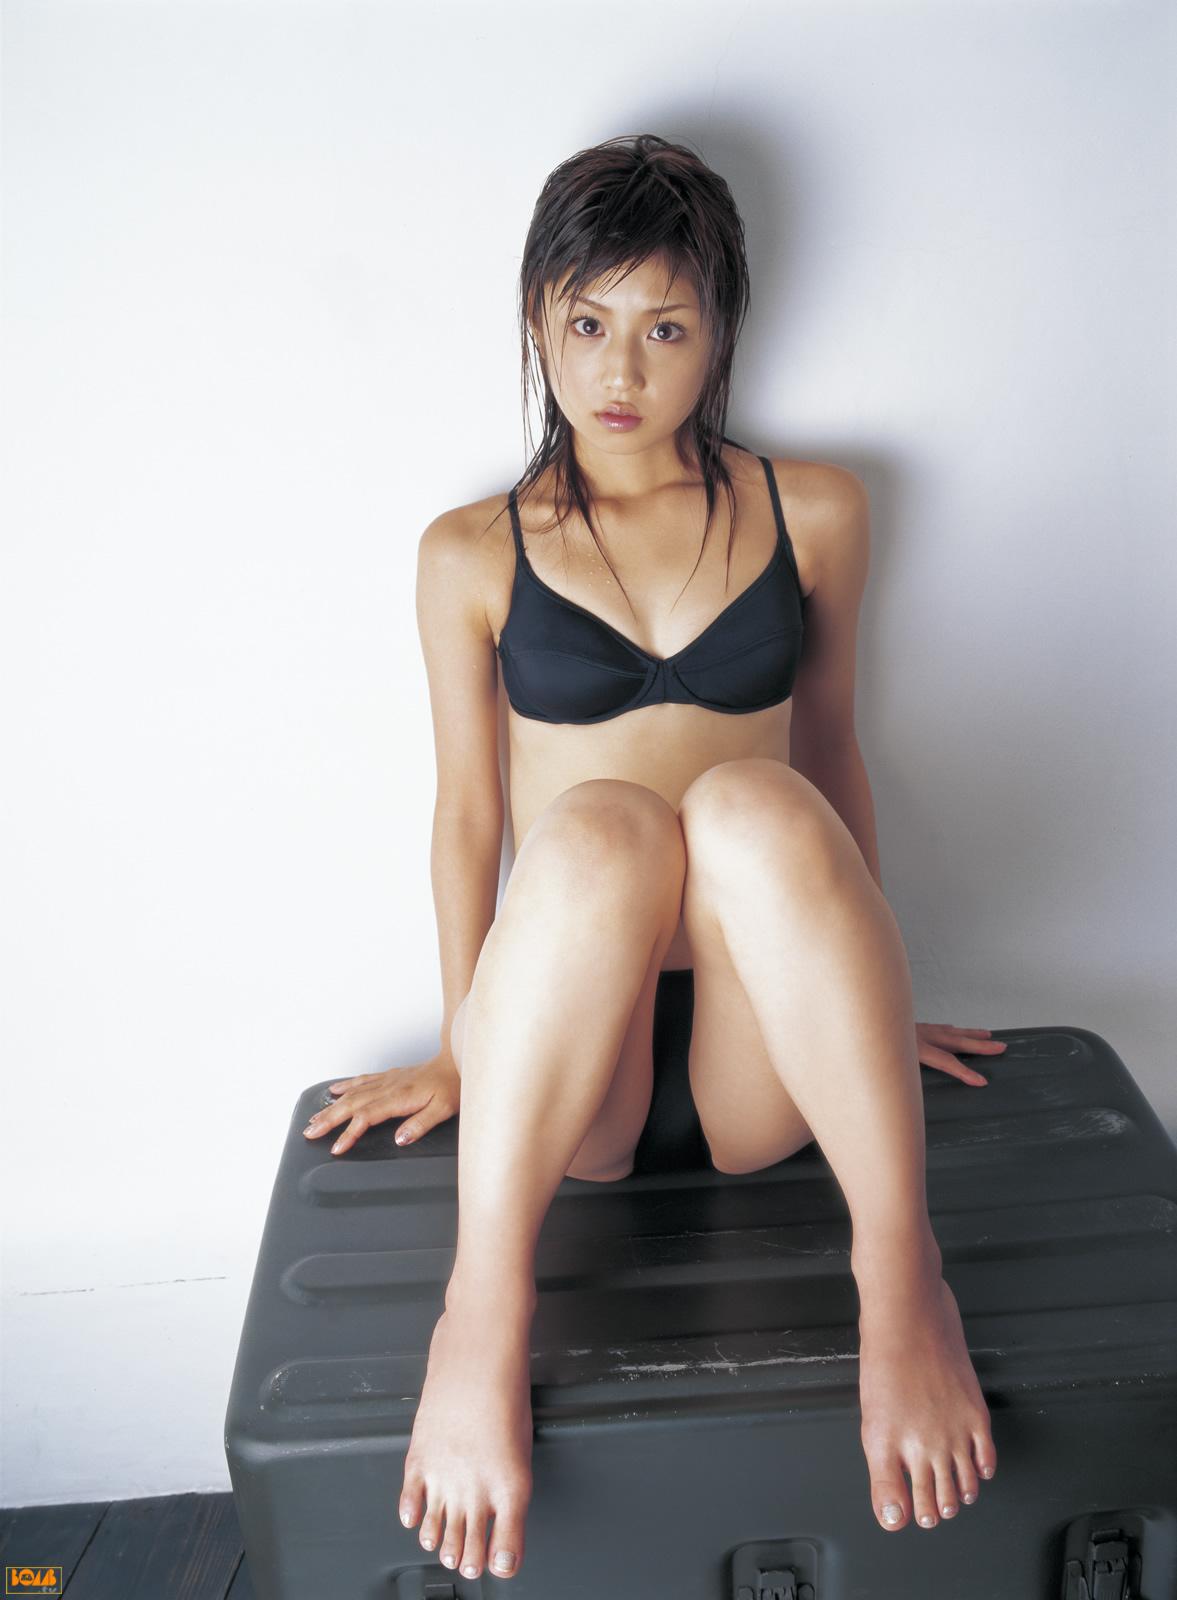 Foto Orang Jepang Ngentot Foto Orang Jepang Ngentot